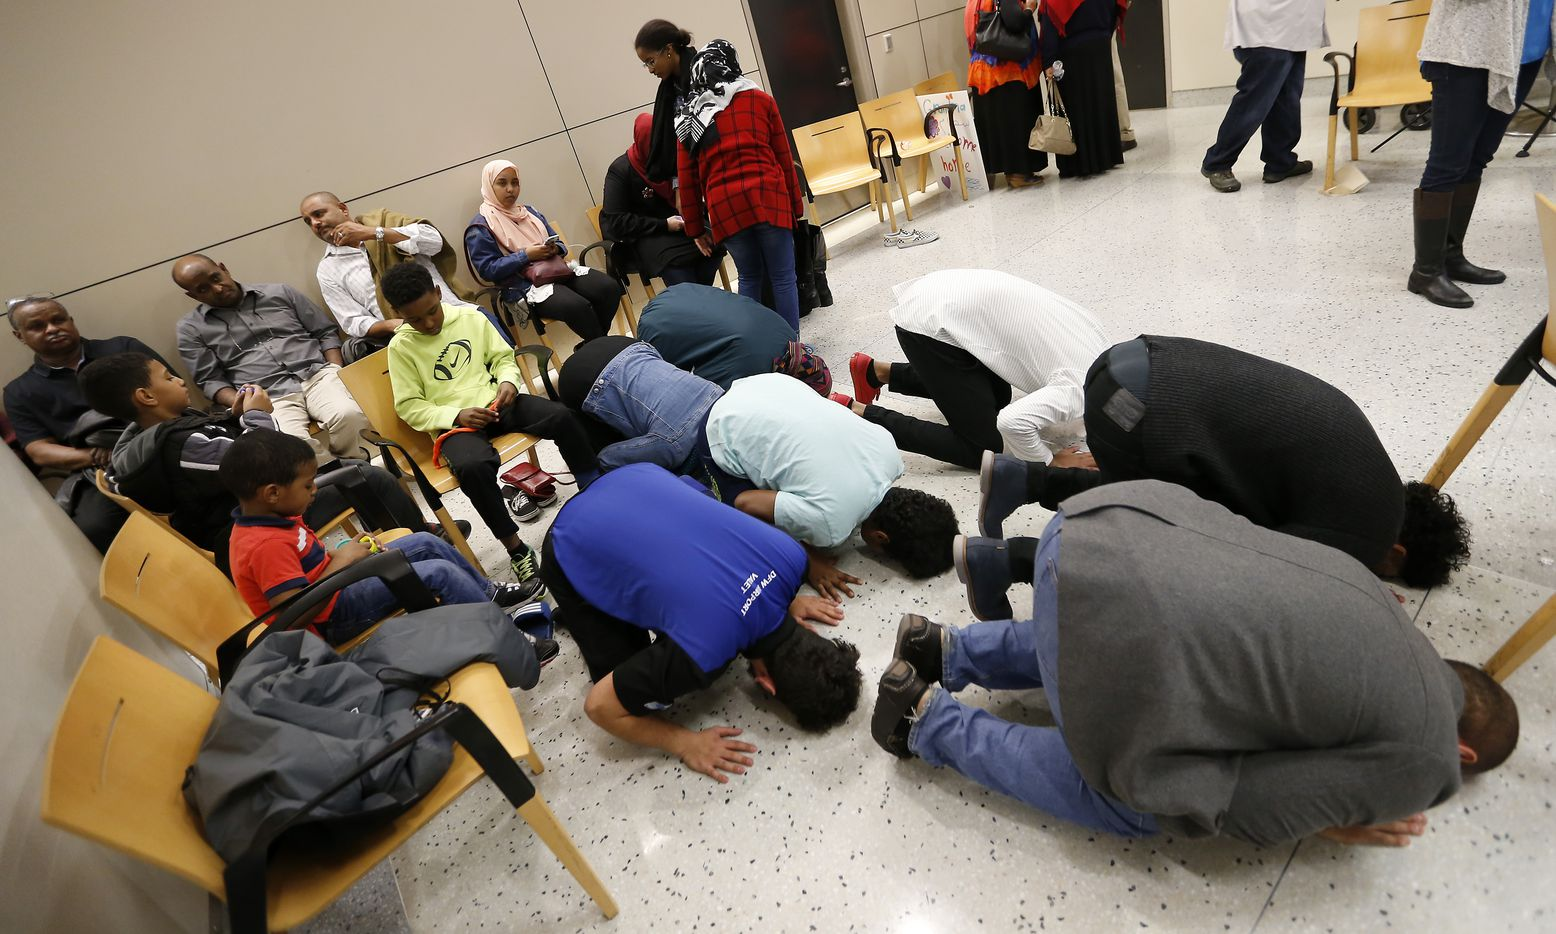 People pray at the international arrives at Dallas/Fort Worth International Airport in Dallas, Saturday, Jan. 28, 2017.